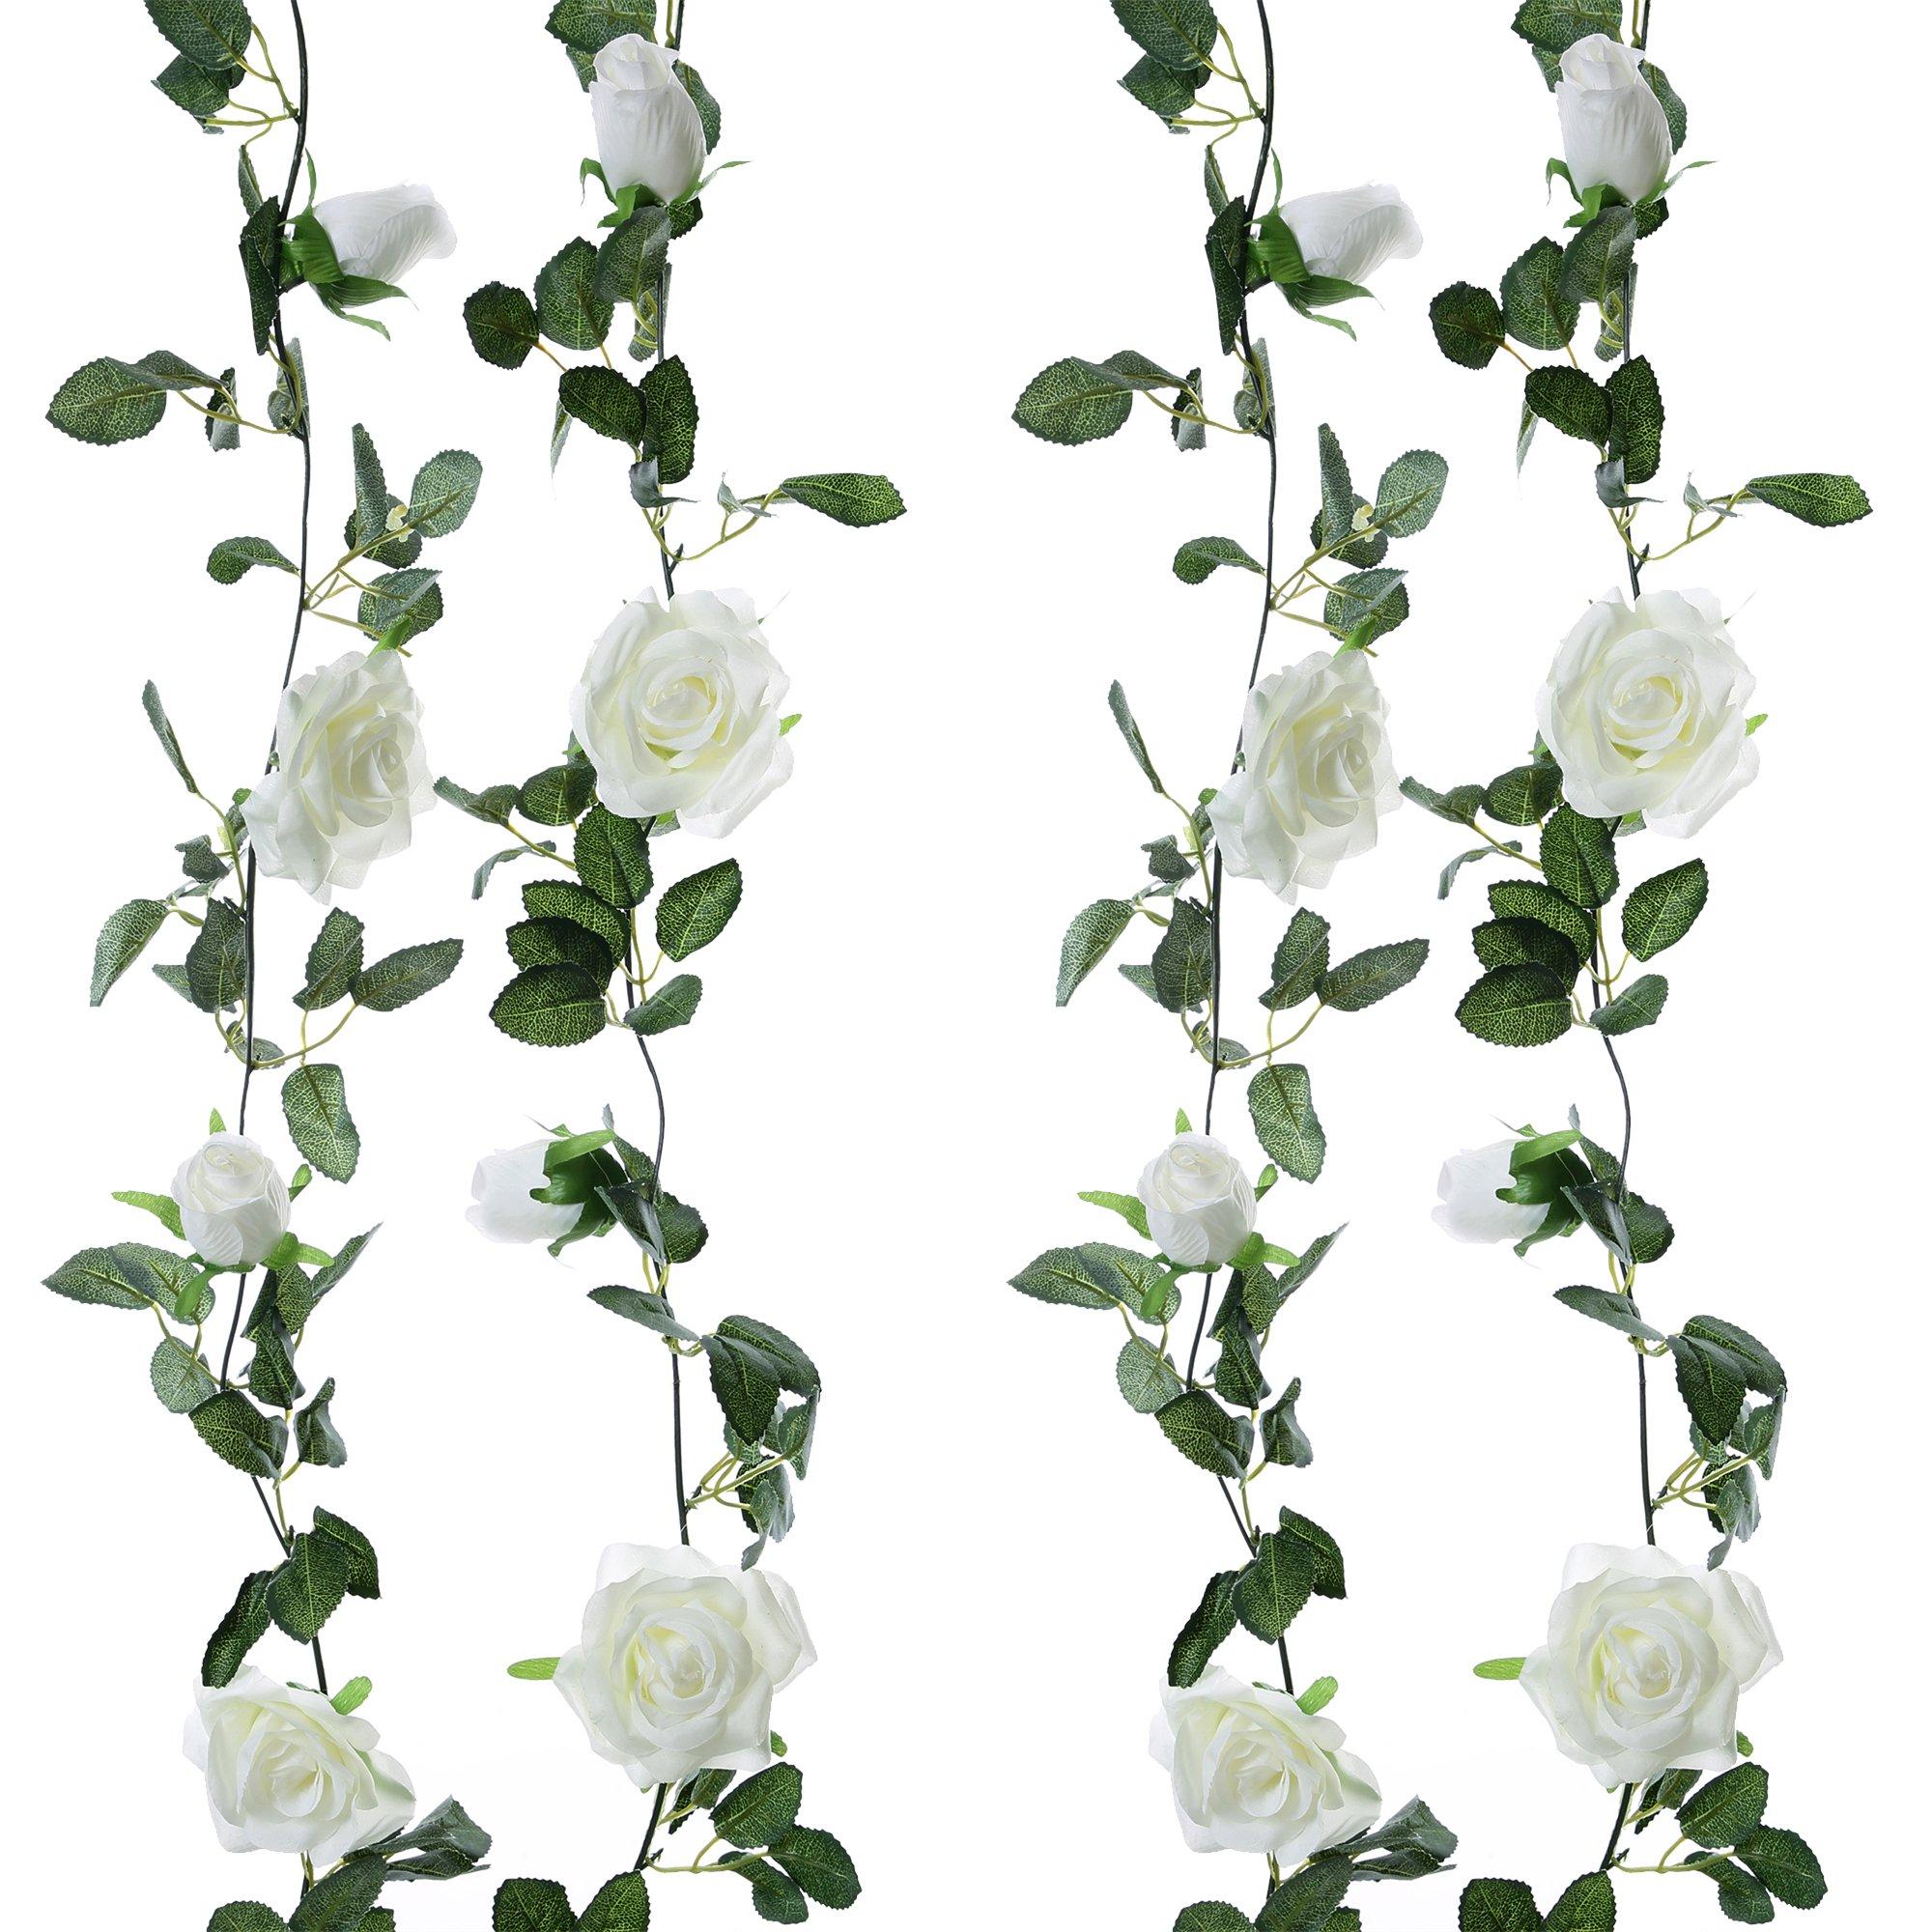 Felice Arts 2pcs 13 FT Fake Rose Vine Flowers Plants Artificial Flower Hanging Rose Ivy Home Hotel Office Wedding Party Garden Craft Art Decor,Cream